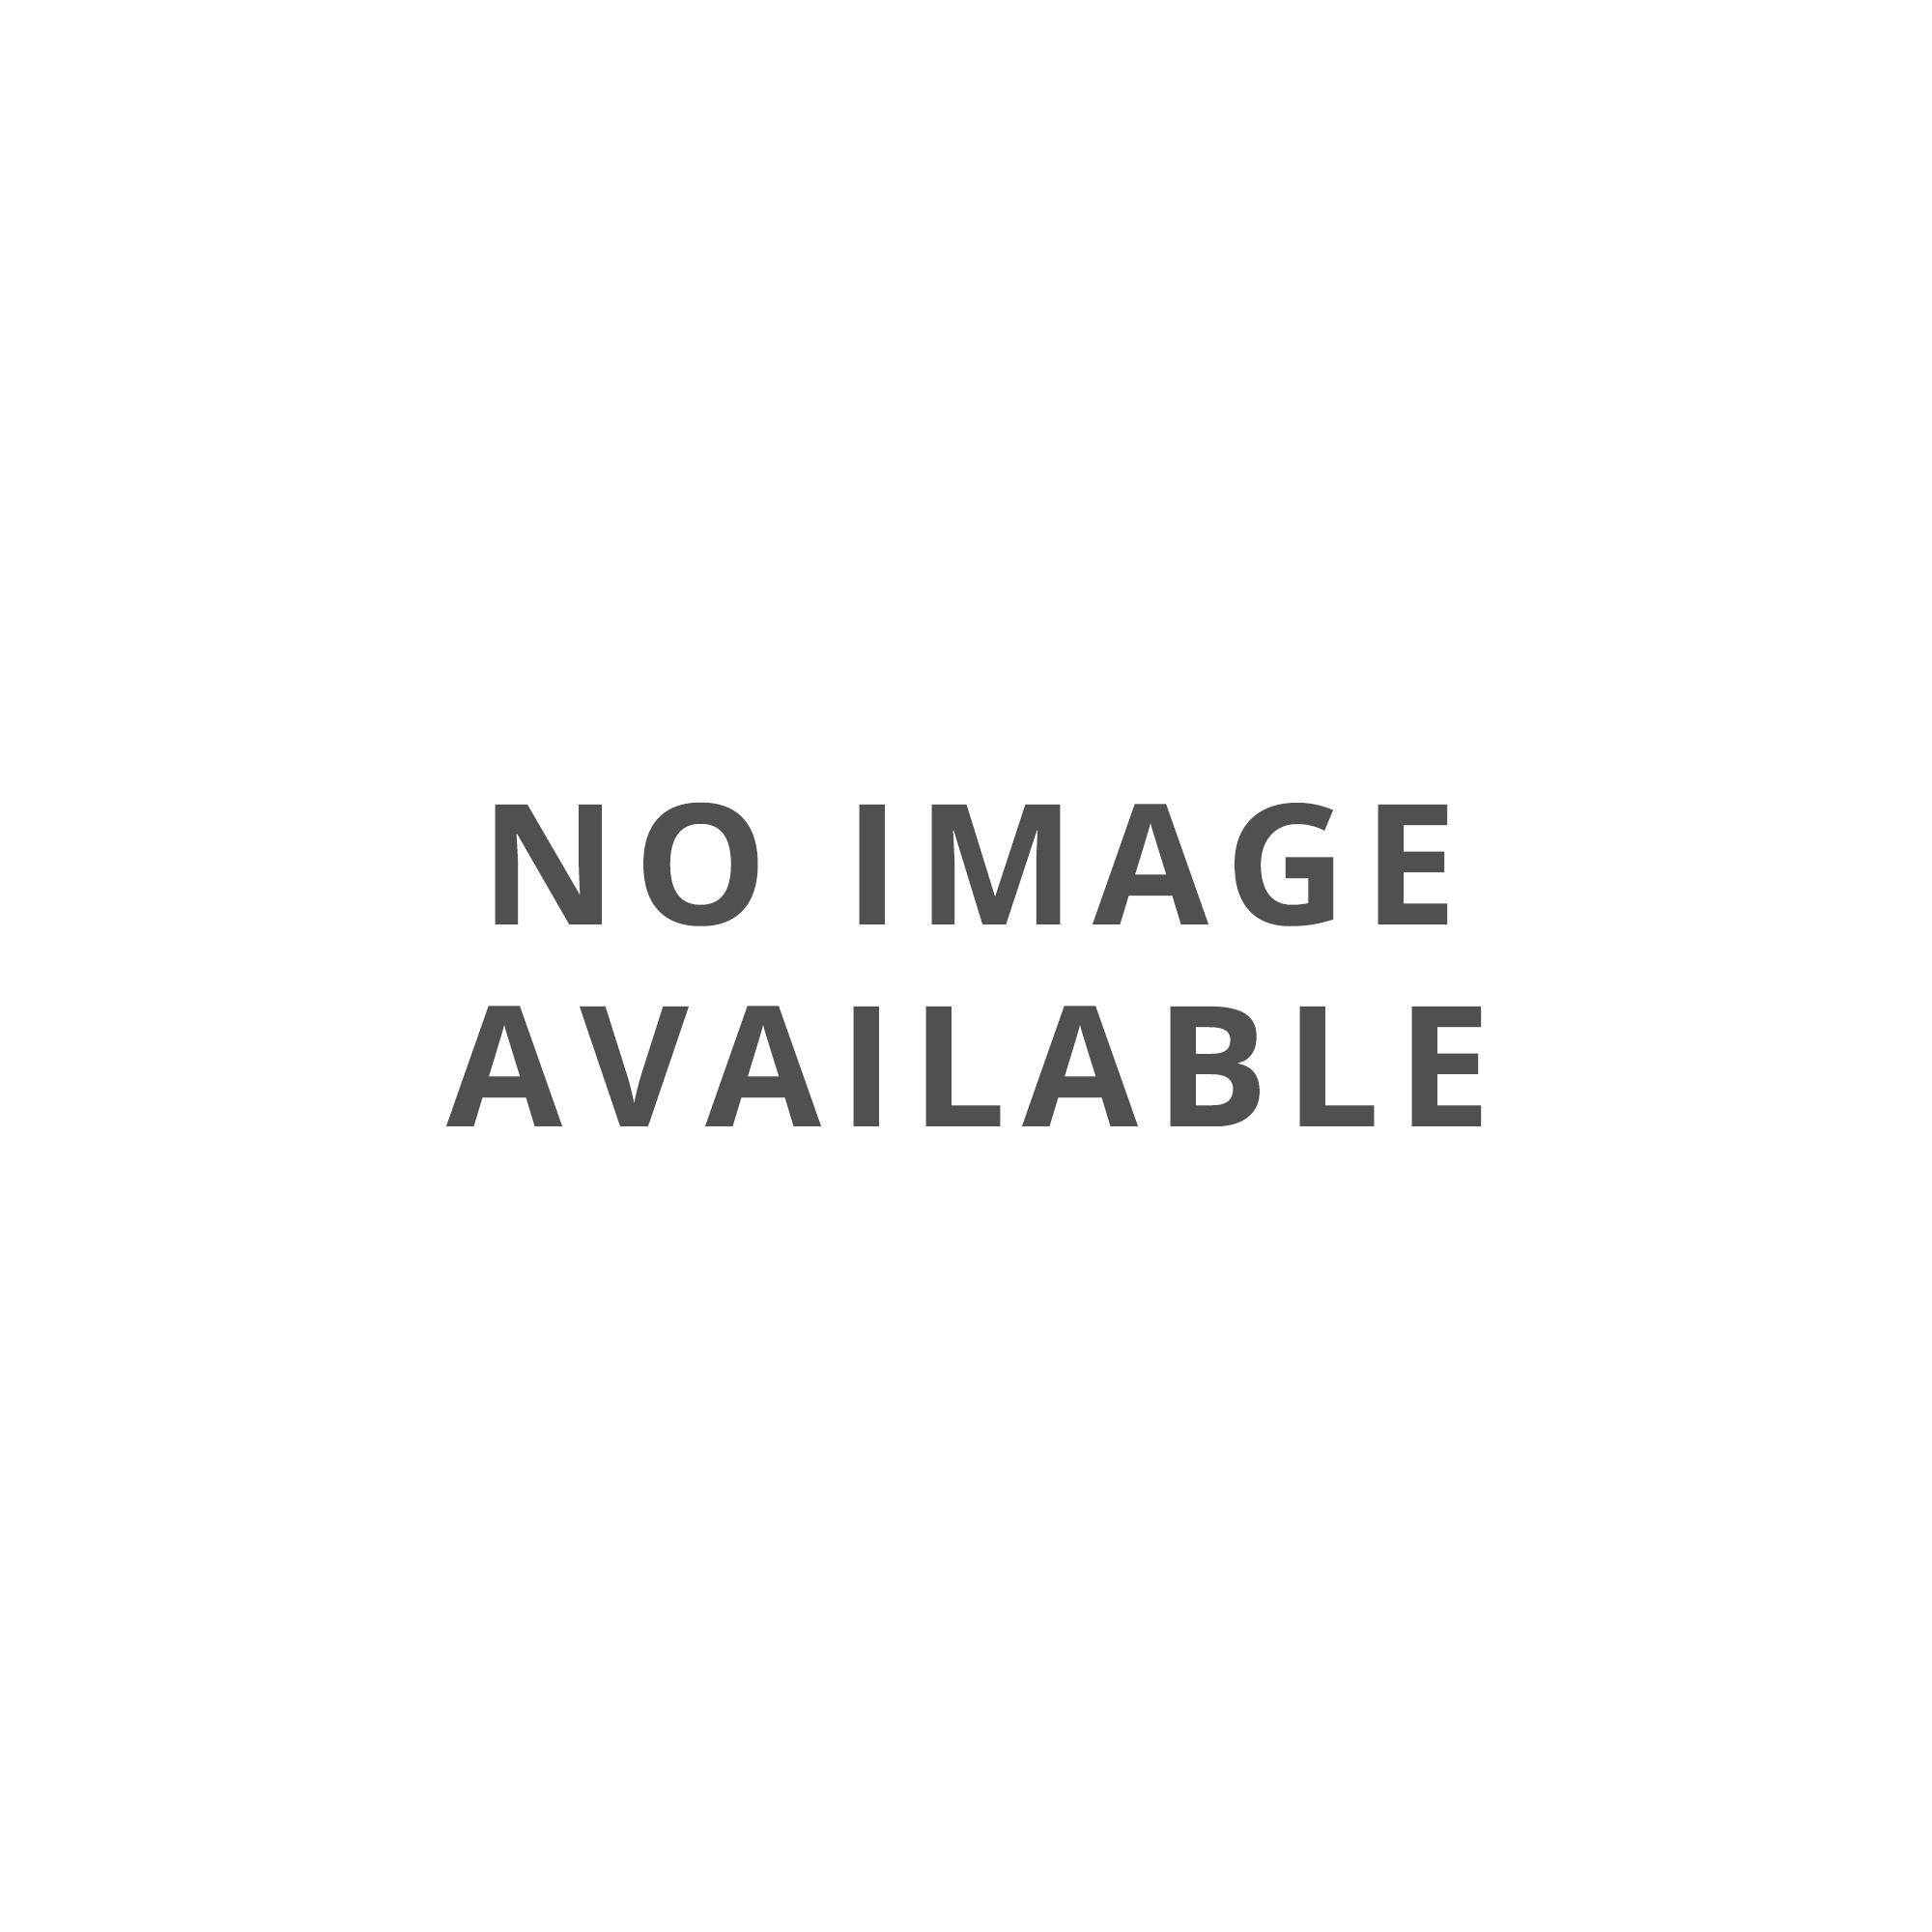 100 deva thermostatic bath shower mixer deva vision chrome deva thermostatic bath shower mixer deva vision chrome wall mounted basin mixer tap vsn122 deva from